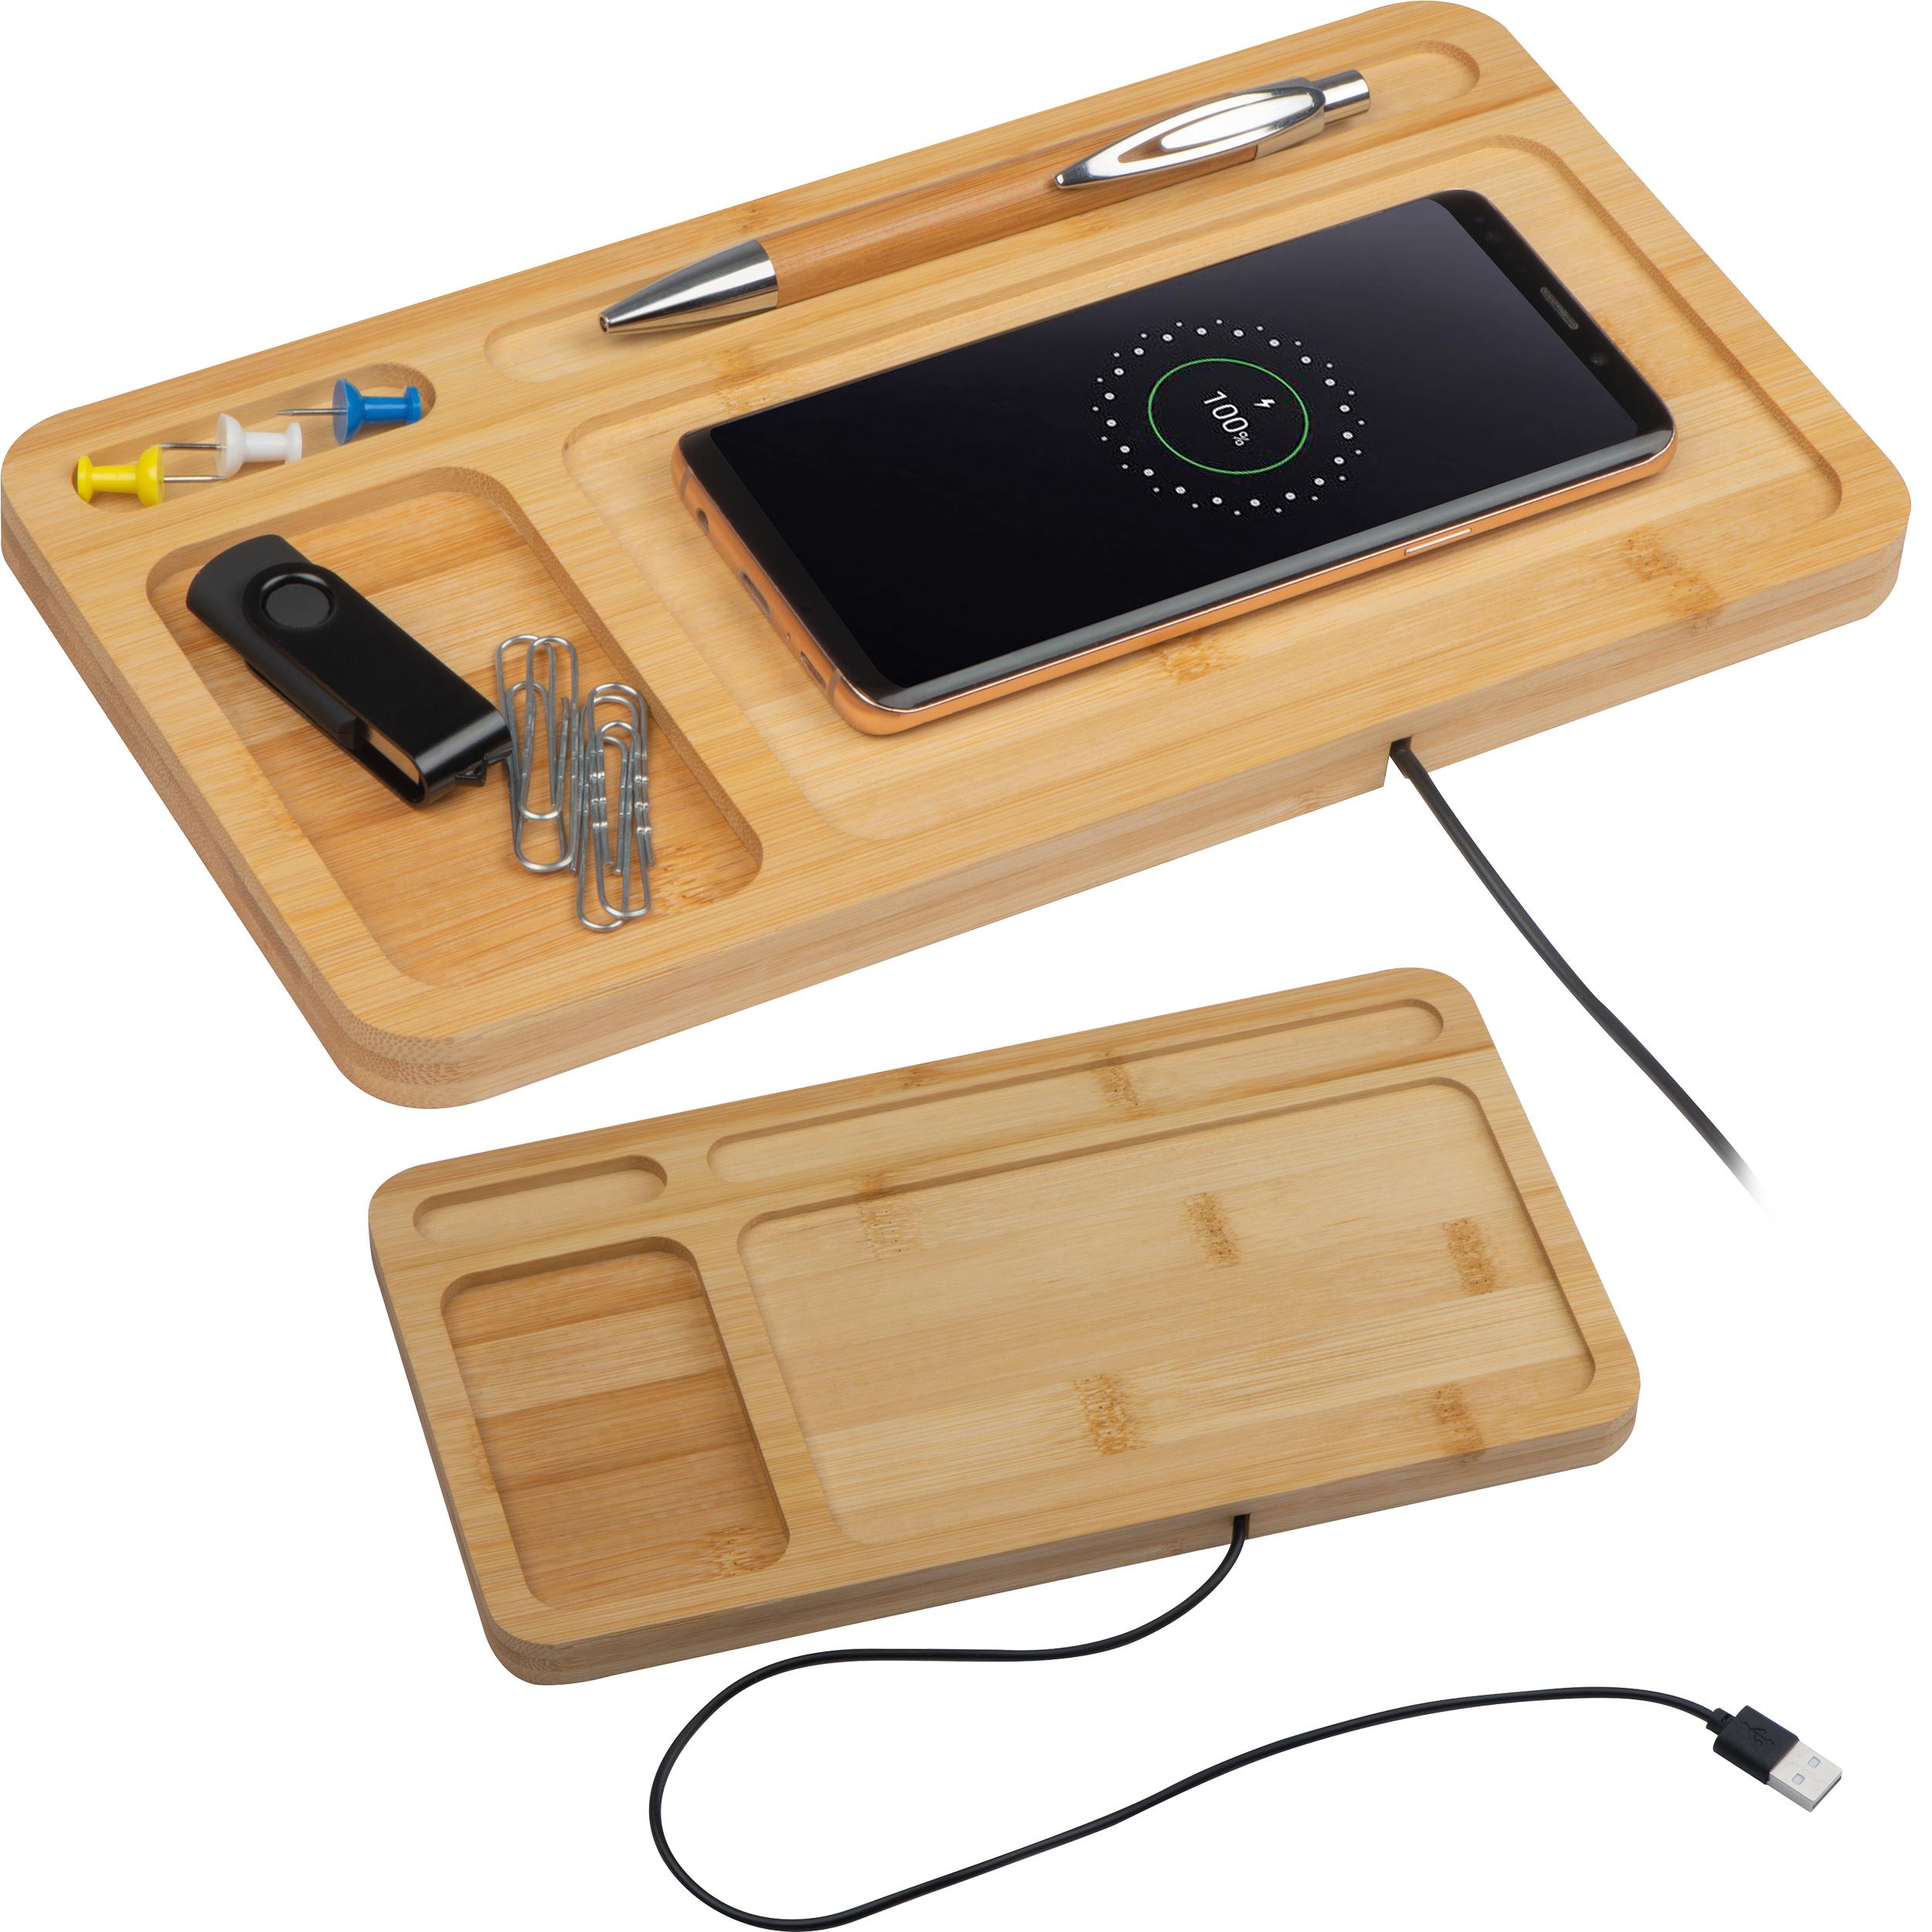 Wireless charging desk pad